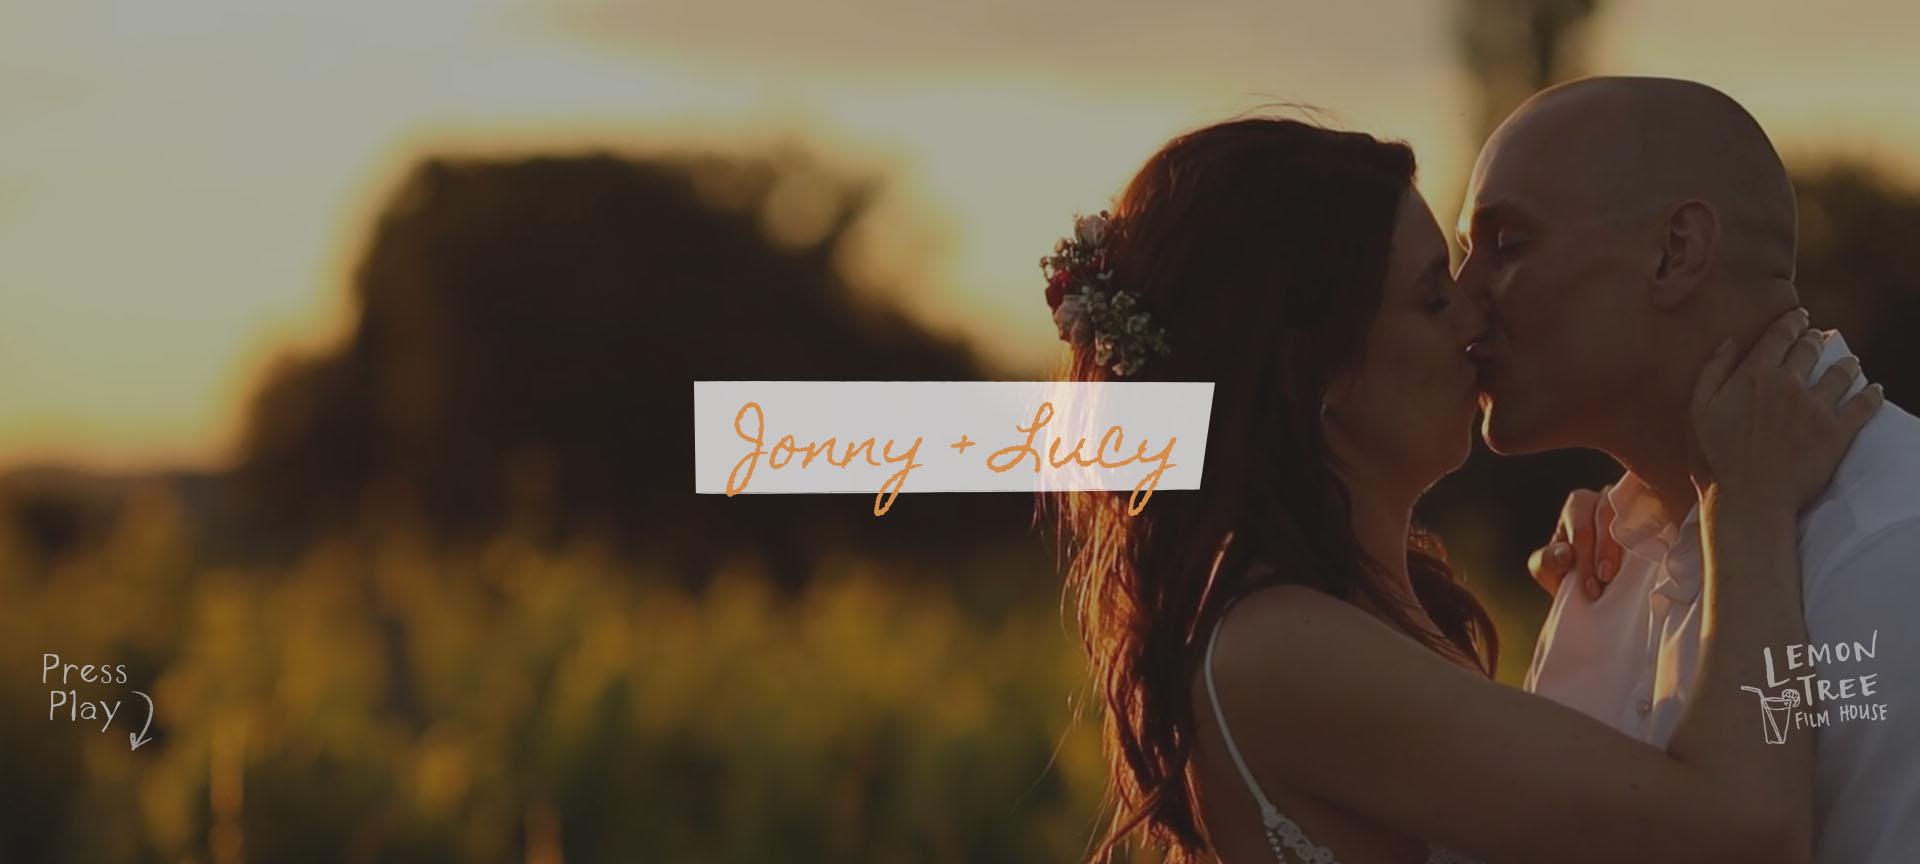 Jonny + Lucy | Bordeaux, France | Chateau Rigaud